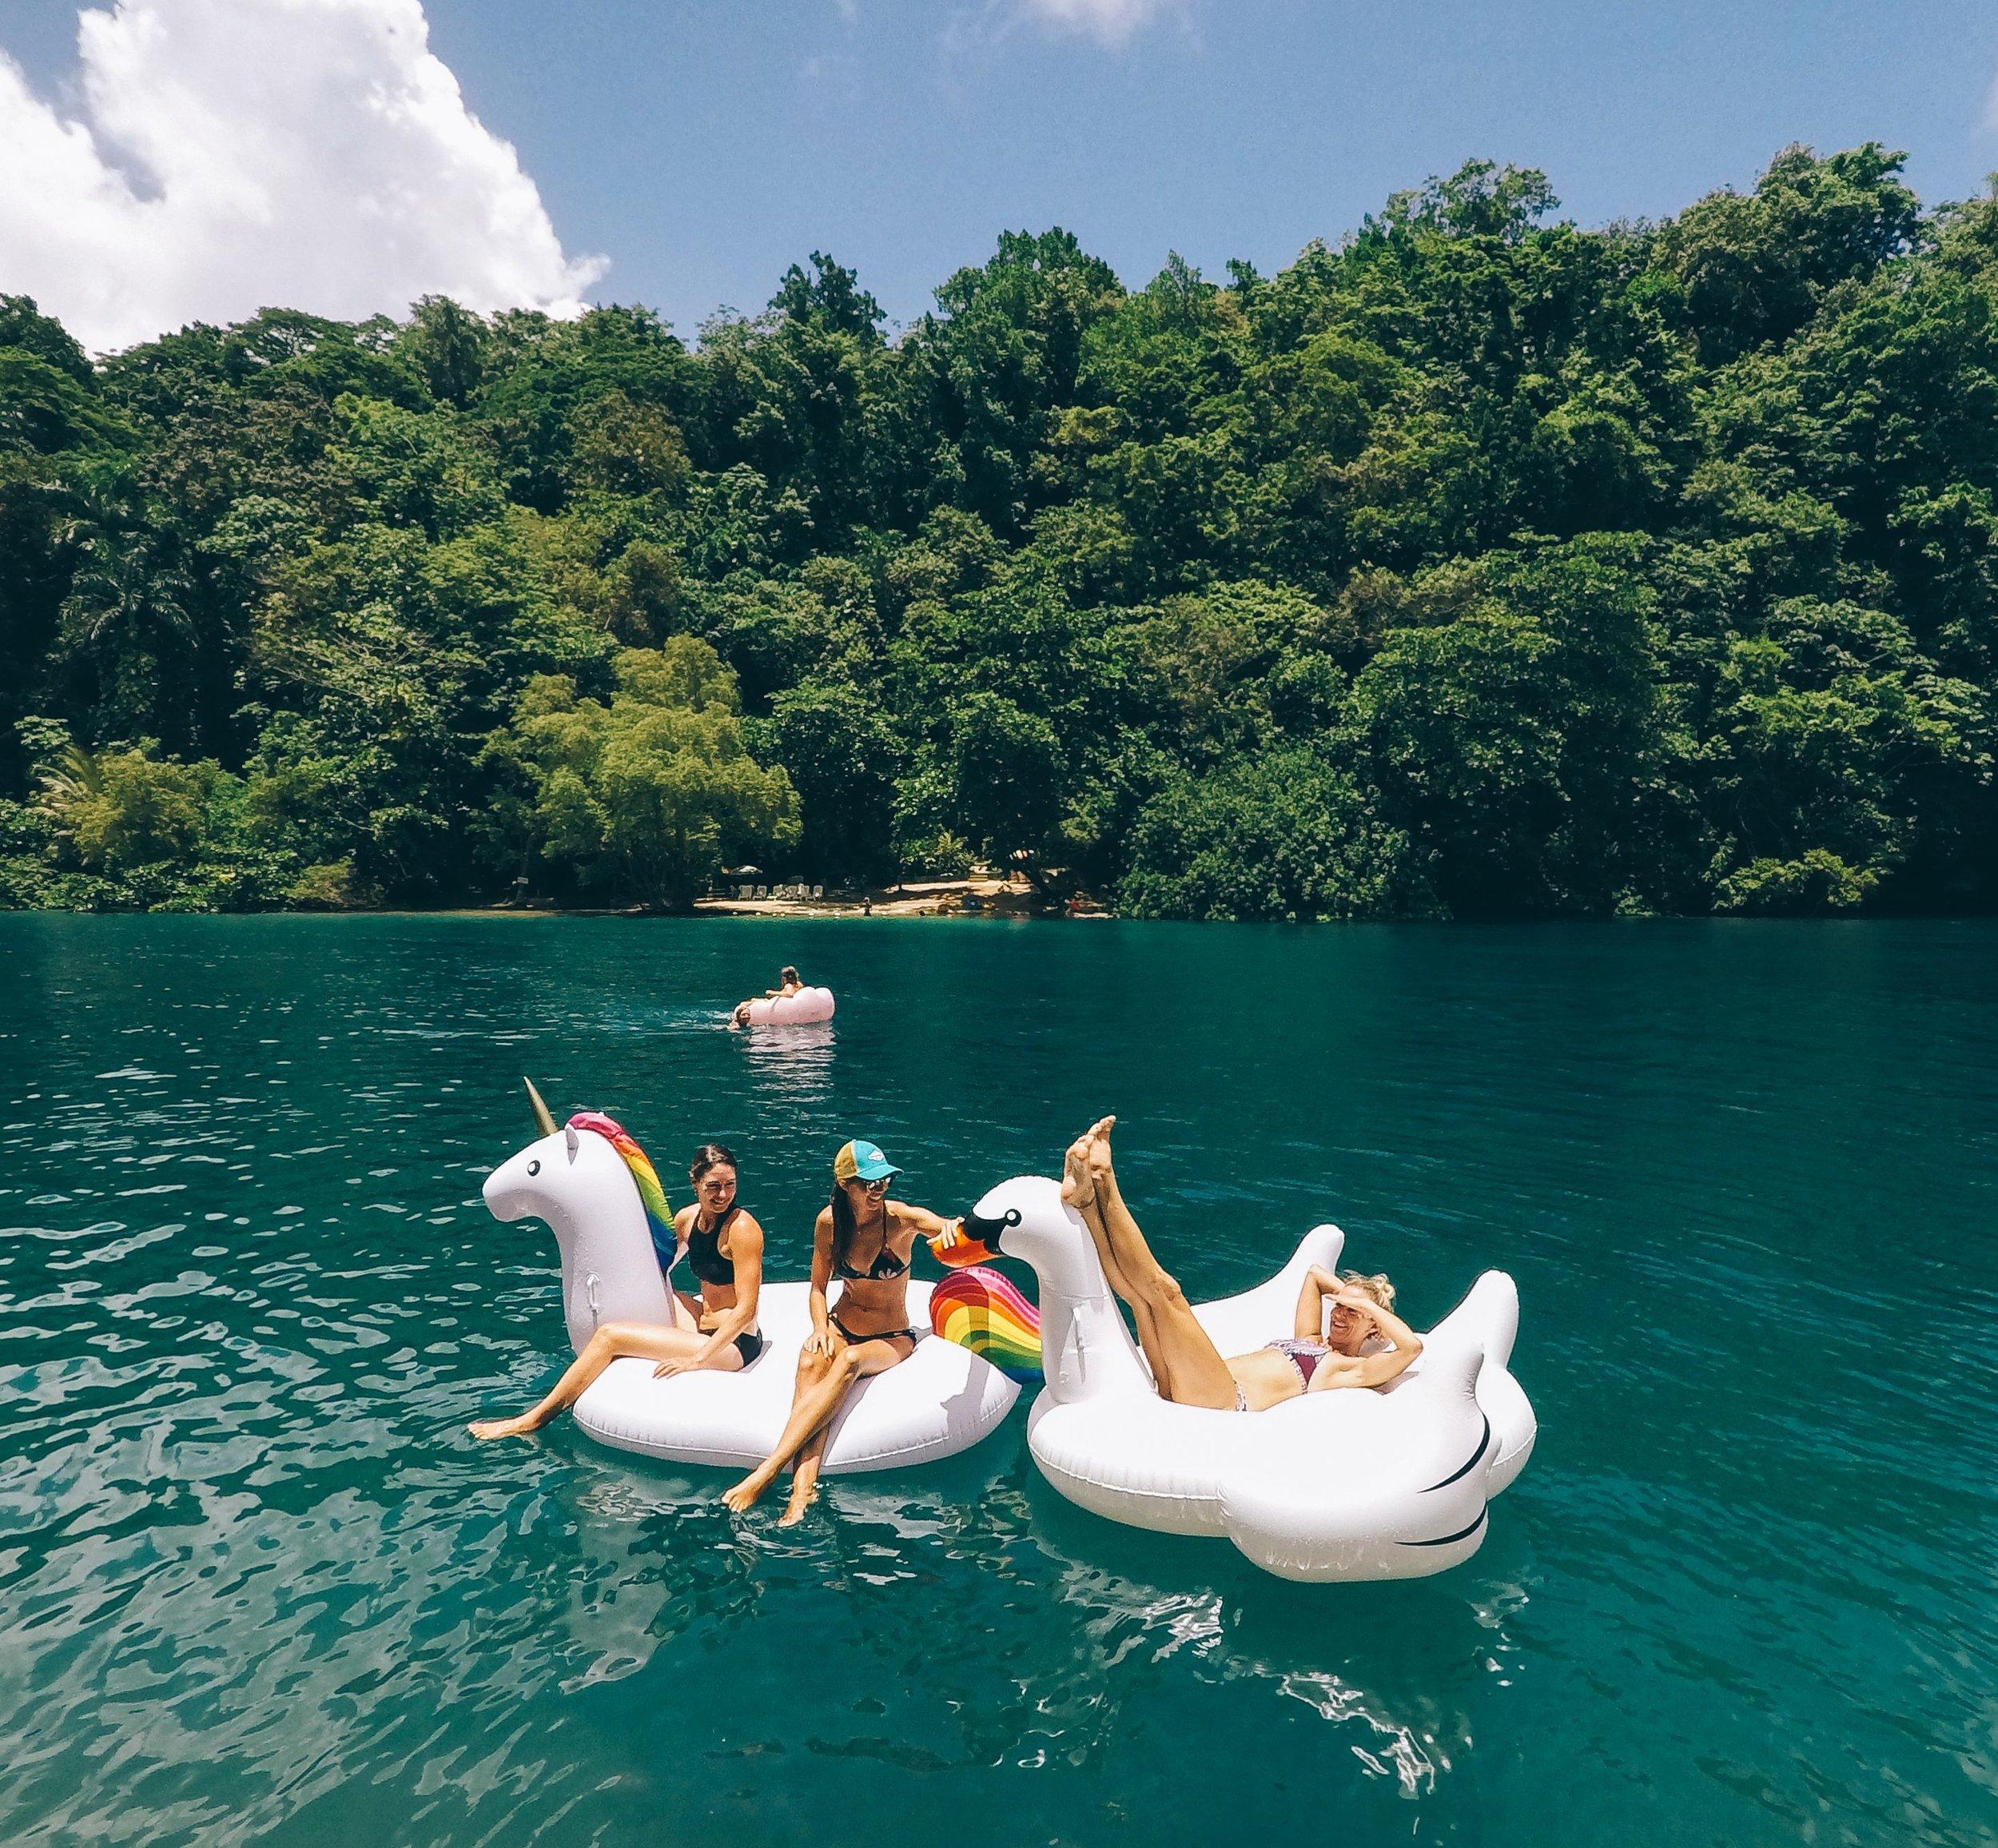 The ladies floating around the Blue Lagoon.